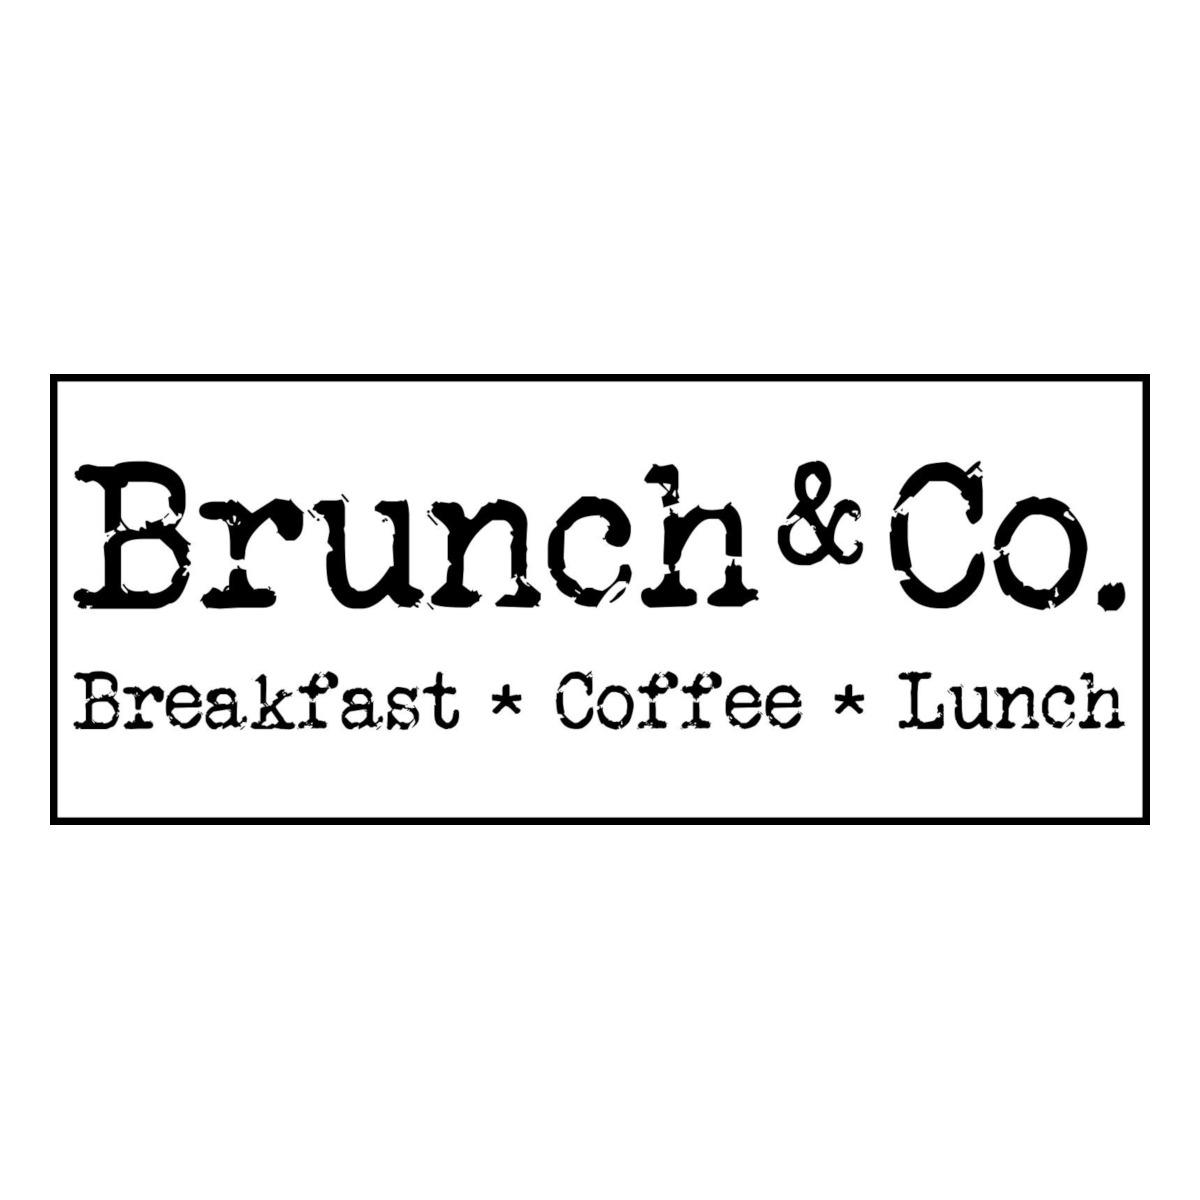 Brunch Co logo 1200x1200